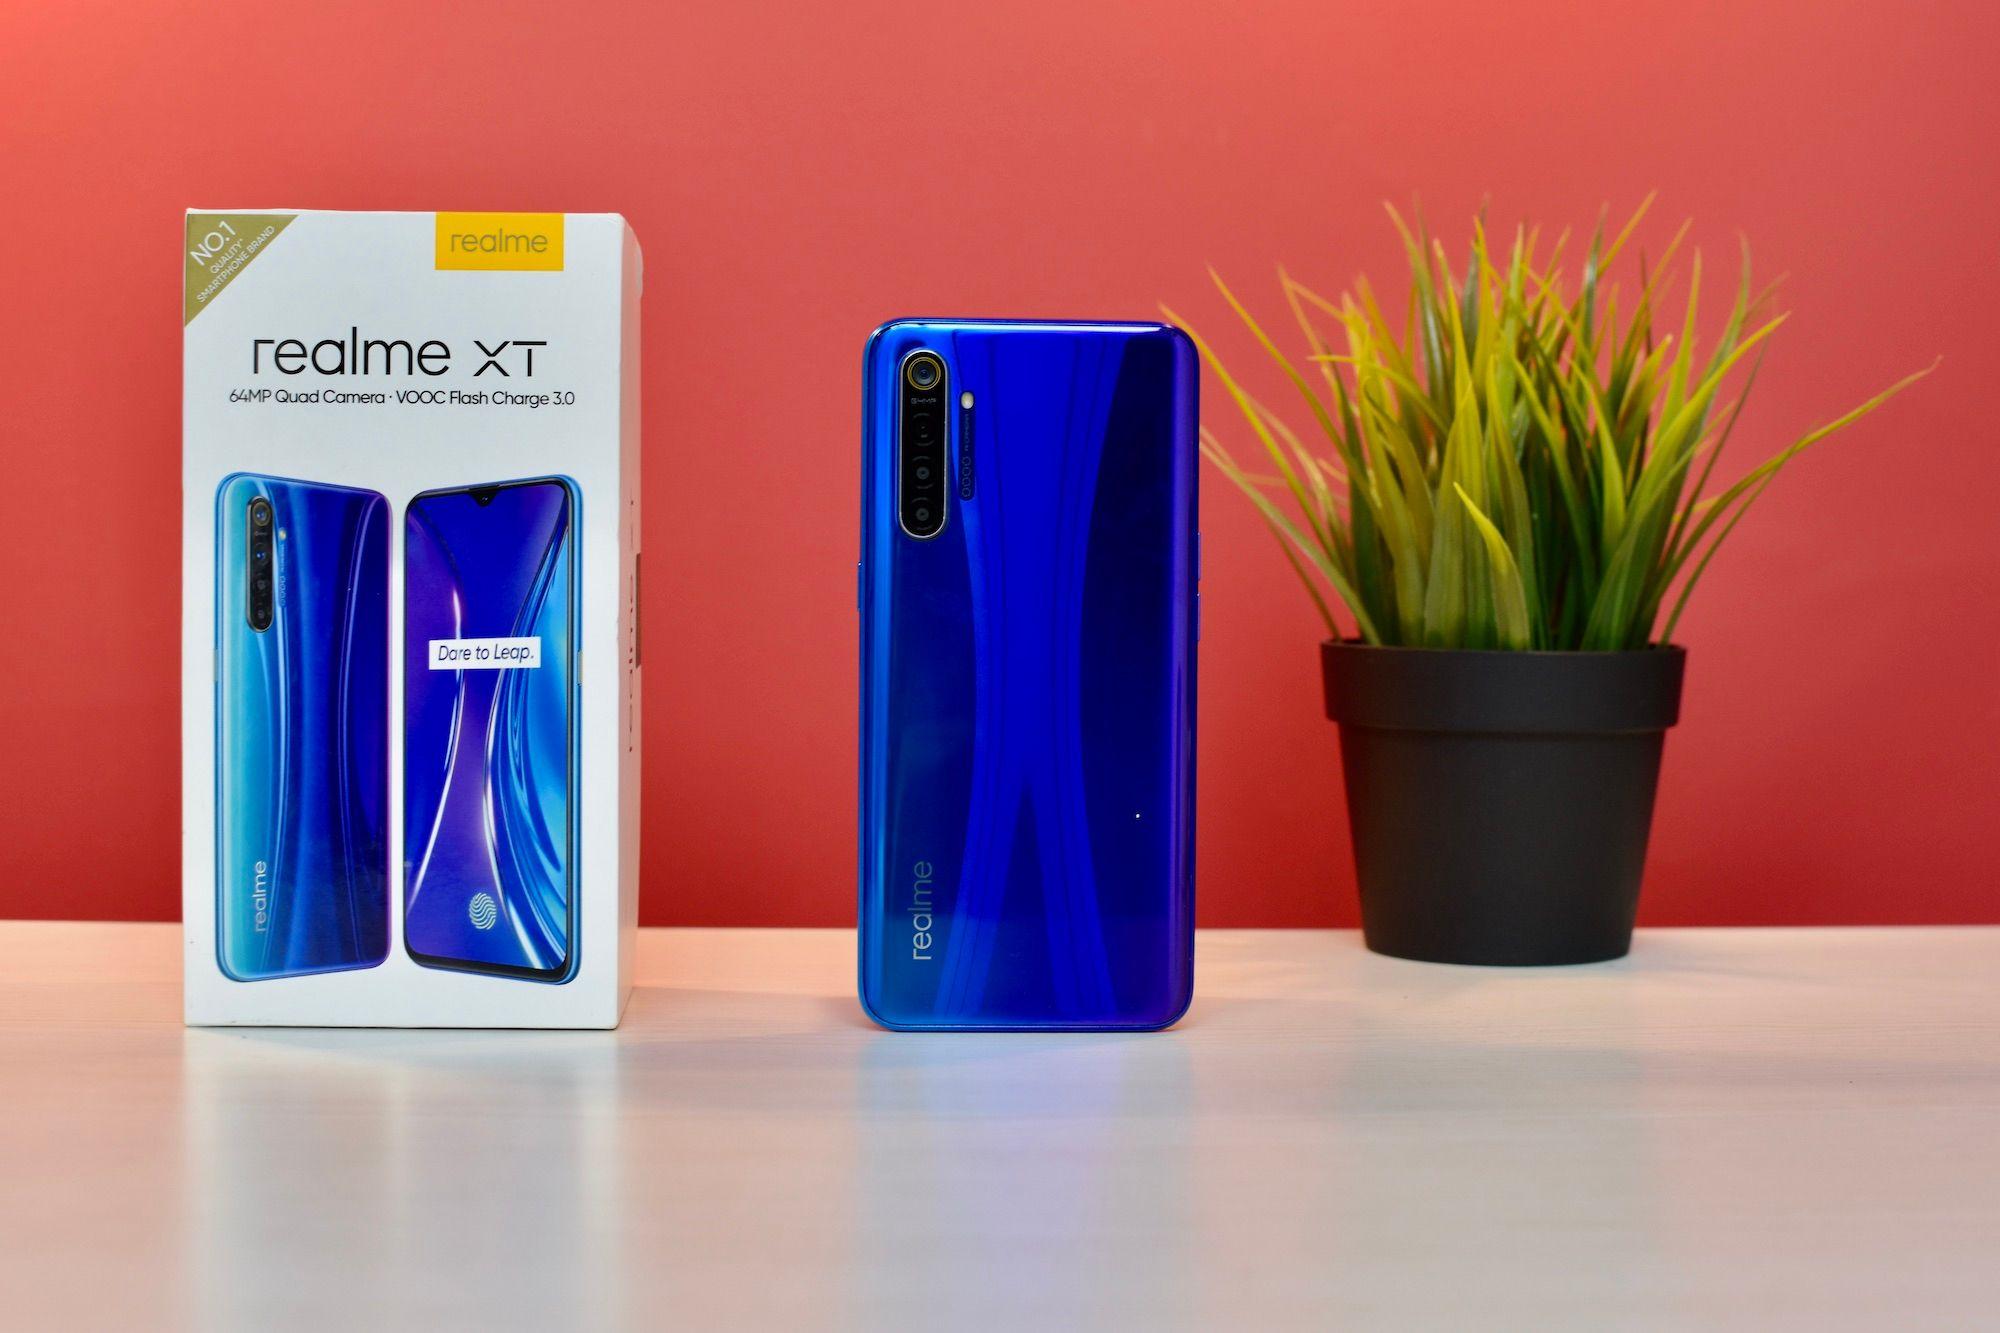 Realme XT Rear Design With Box